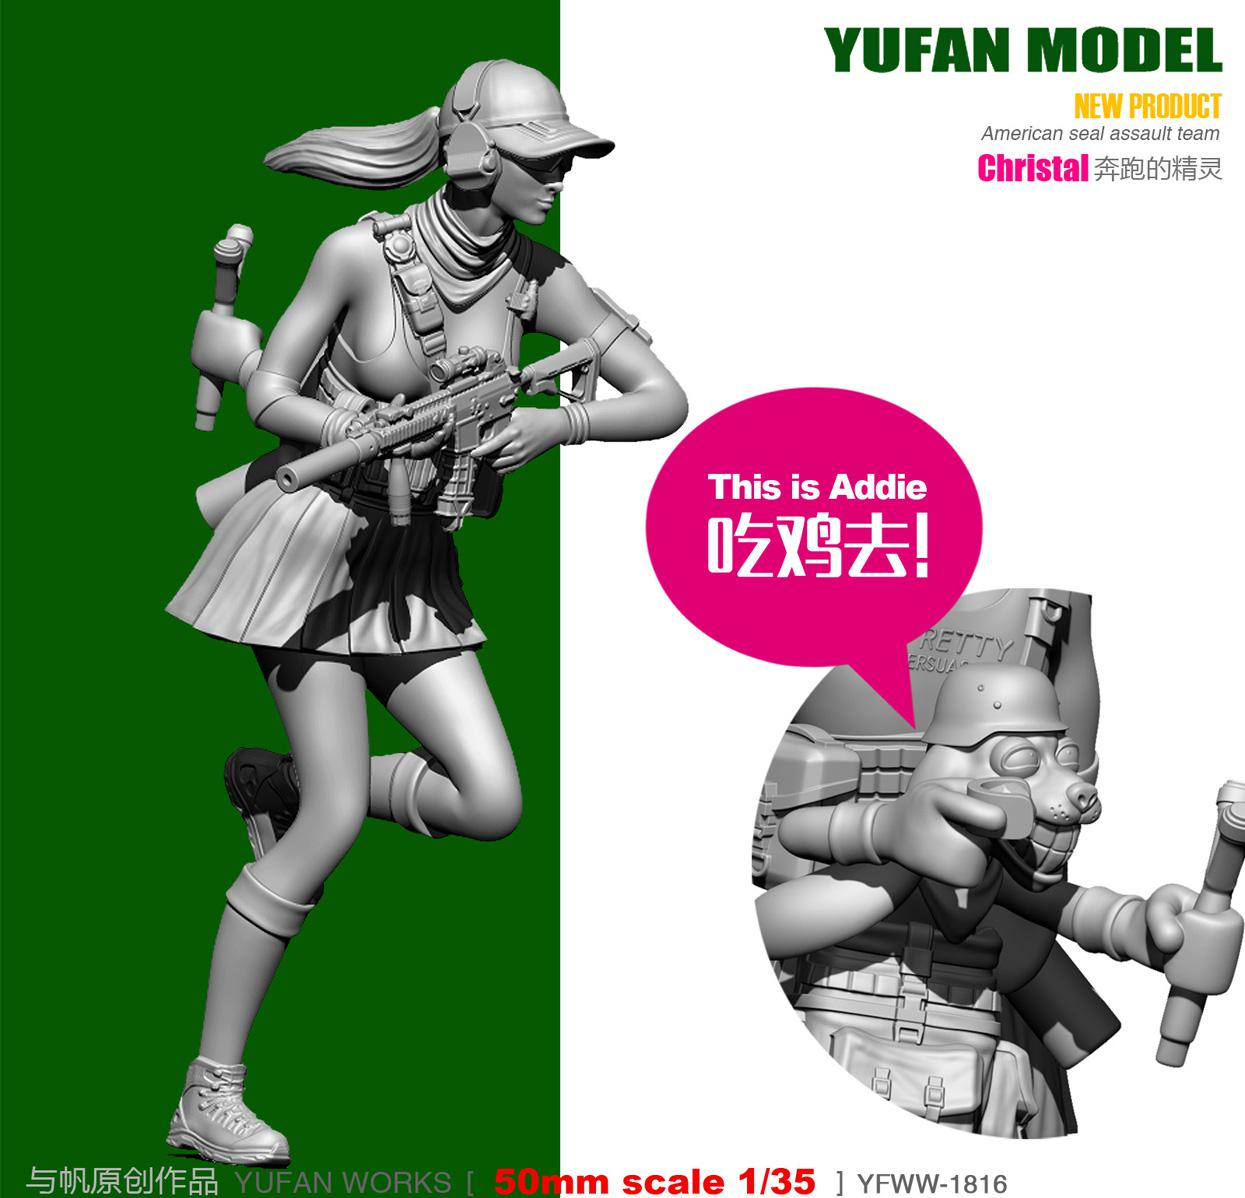 Yufan modelo 1/35 Kit de modelo de soldado de resina que funciona originalmente con elfos comer pollo figura YFWW35-1816